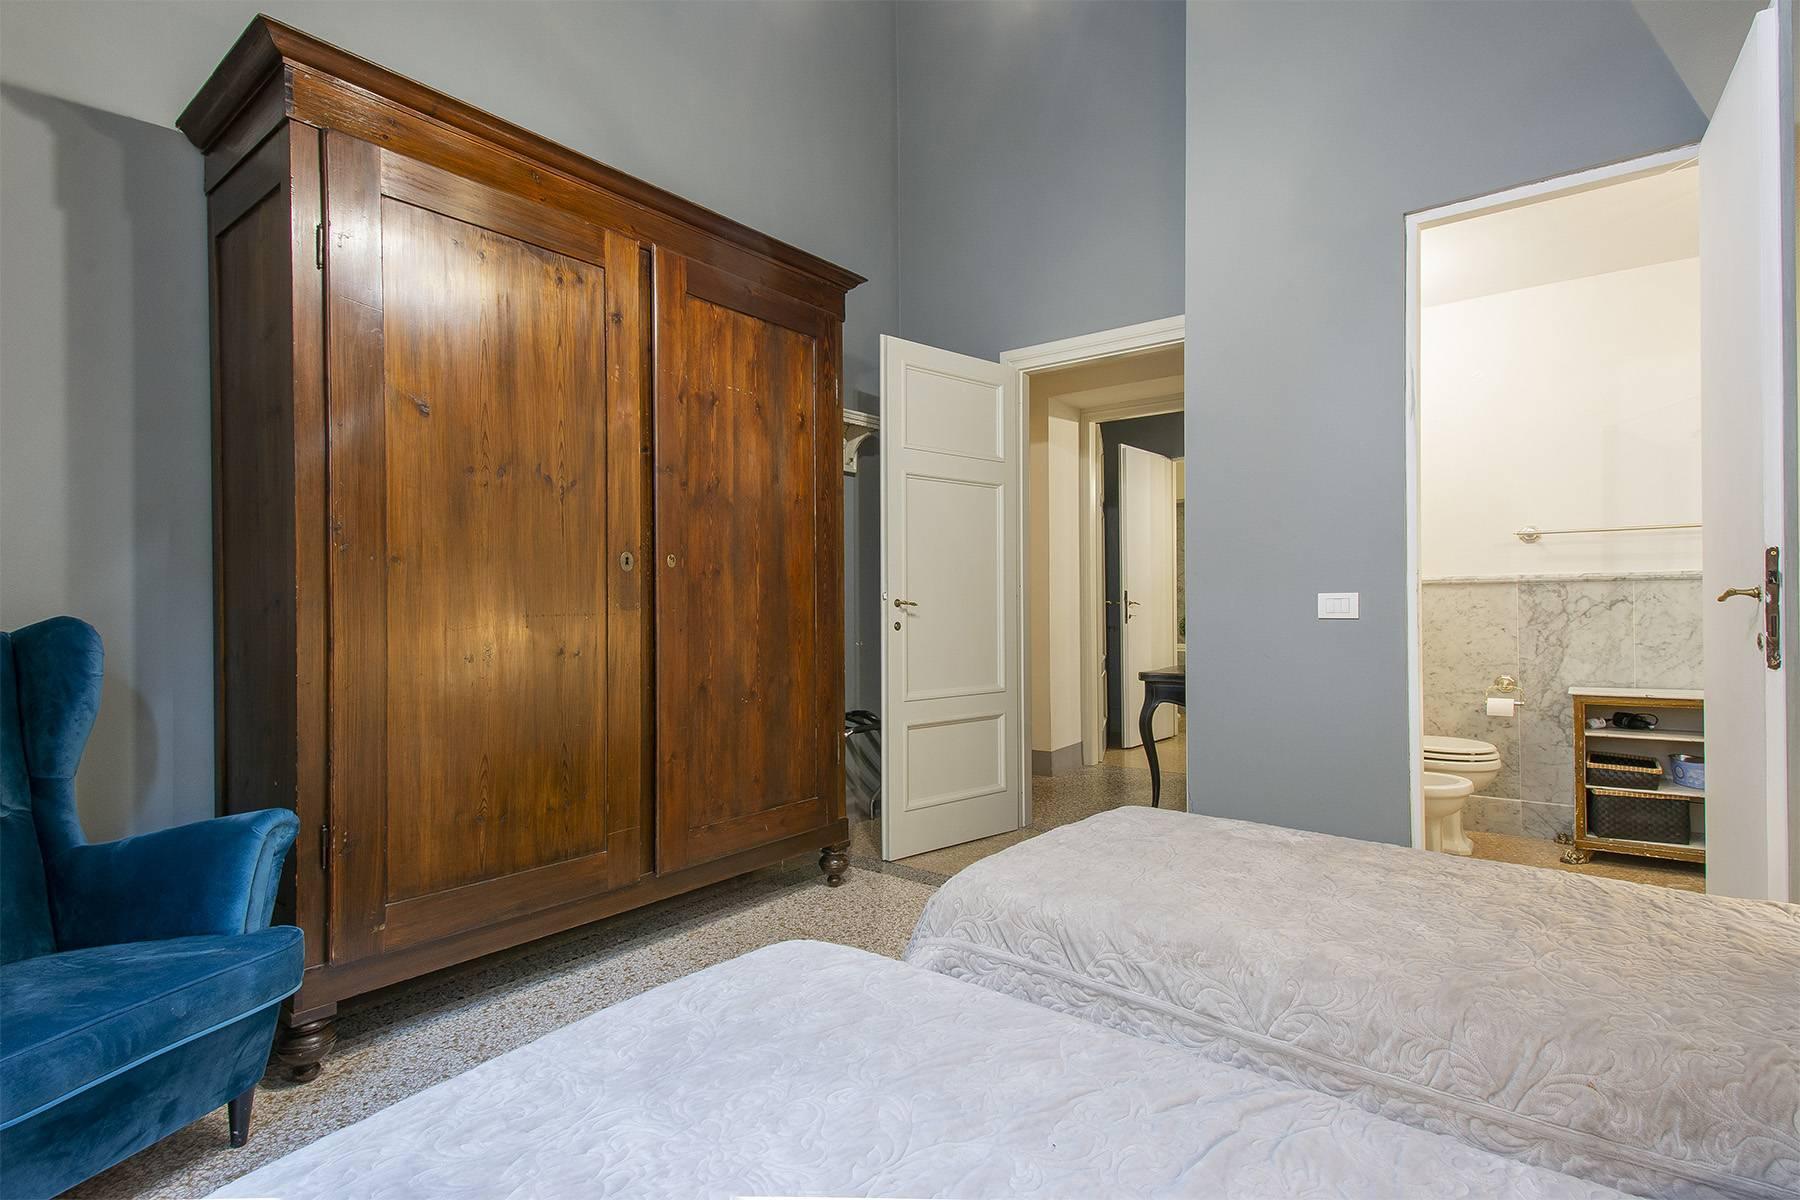 Appartement exclusif au coeur de Lucca - 21